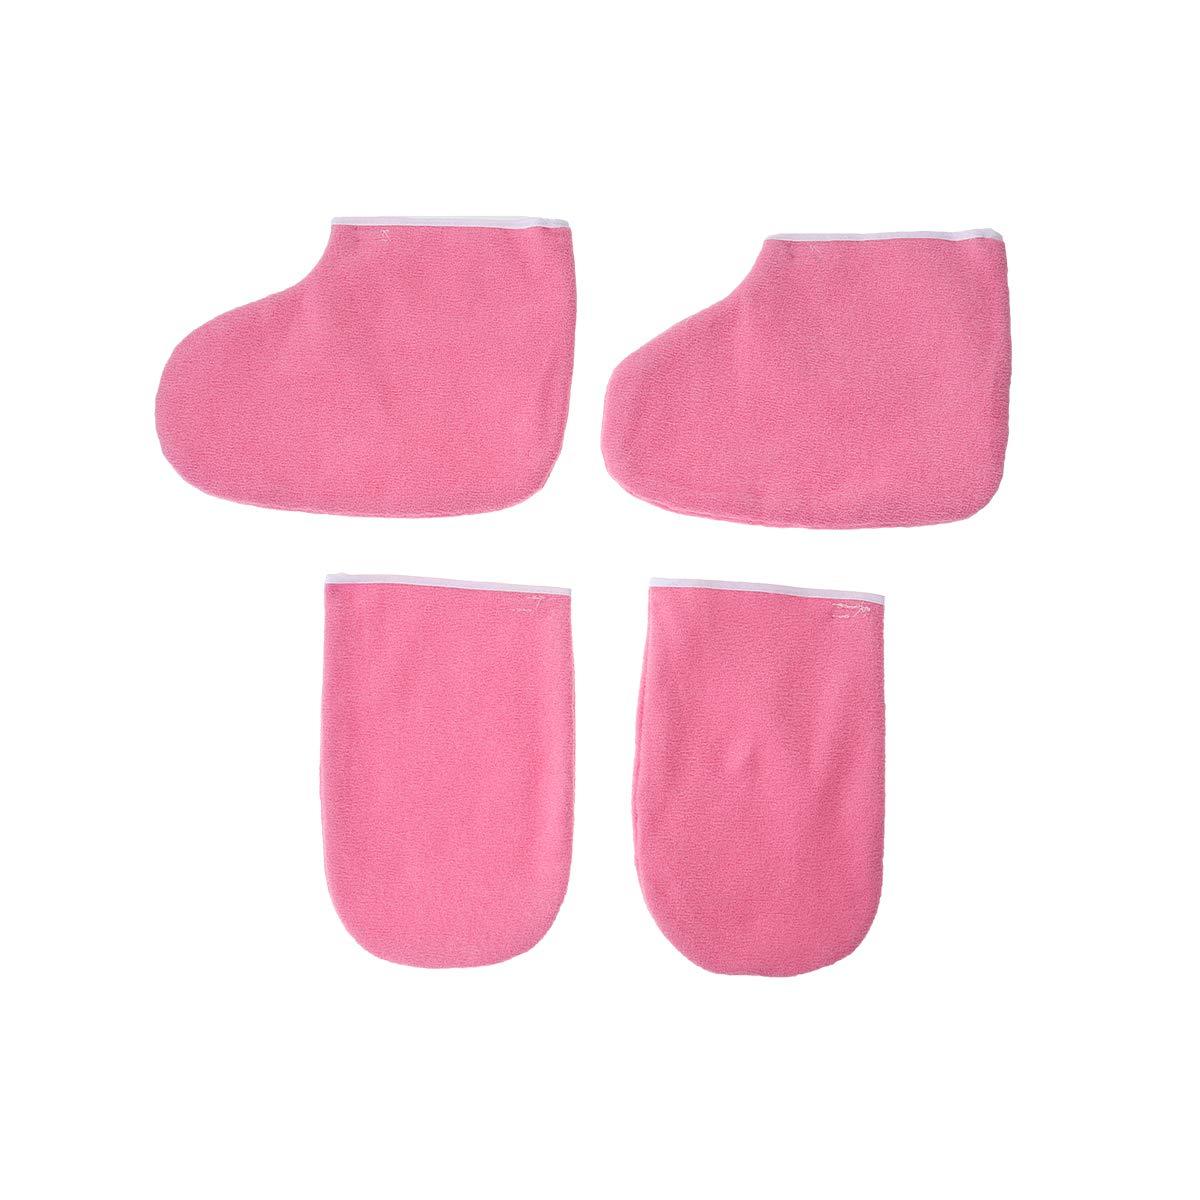 Lurrose 2 paia guanti guanti di stoffa stivaletti piedi mano paraffina Warmer WaxCare Set